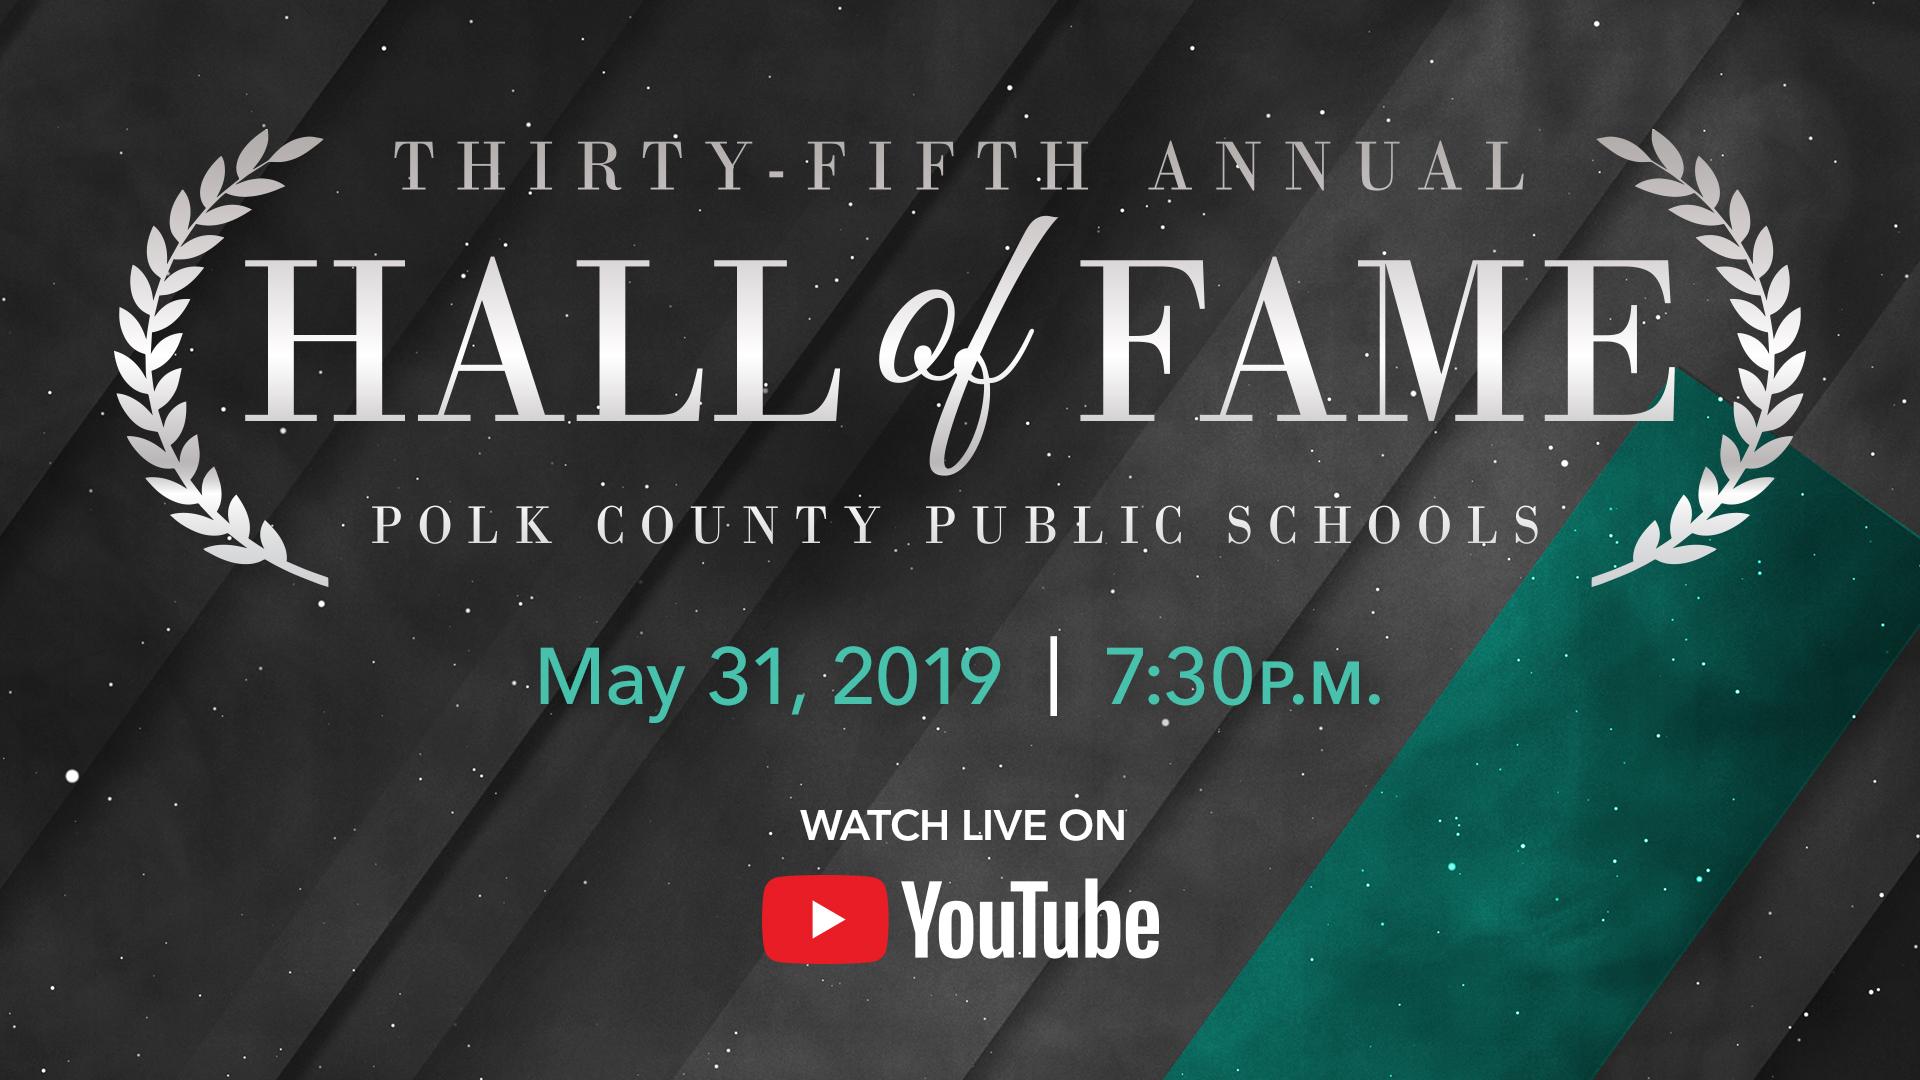 2019 Hall of Fame banner